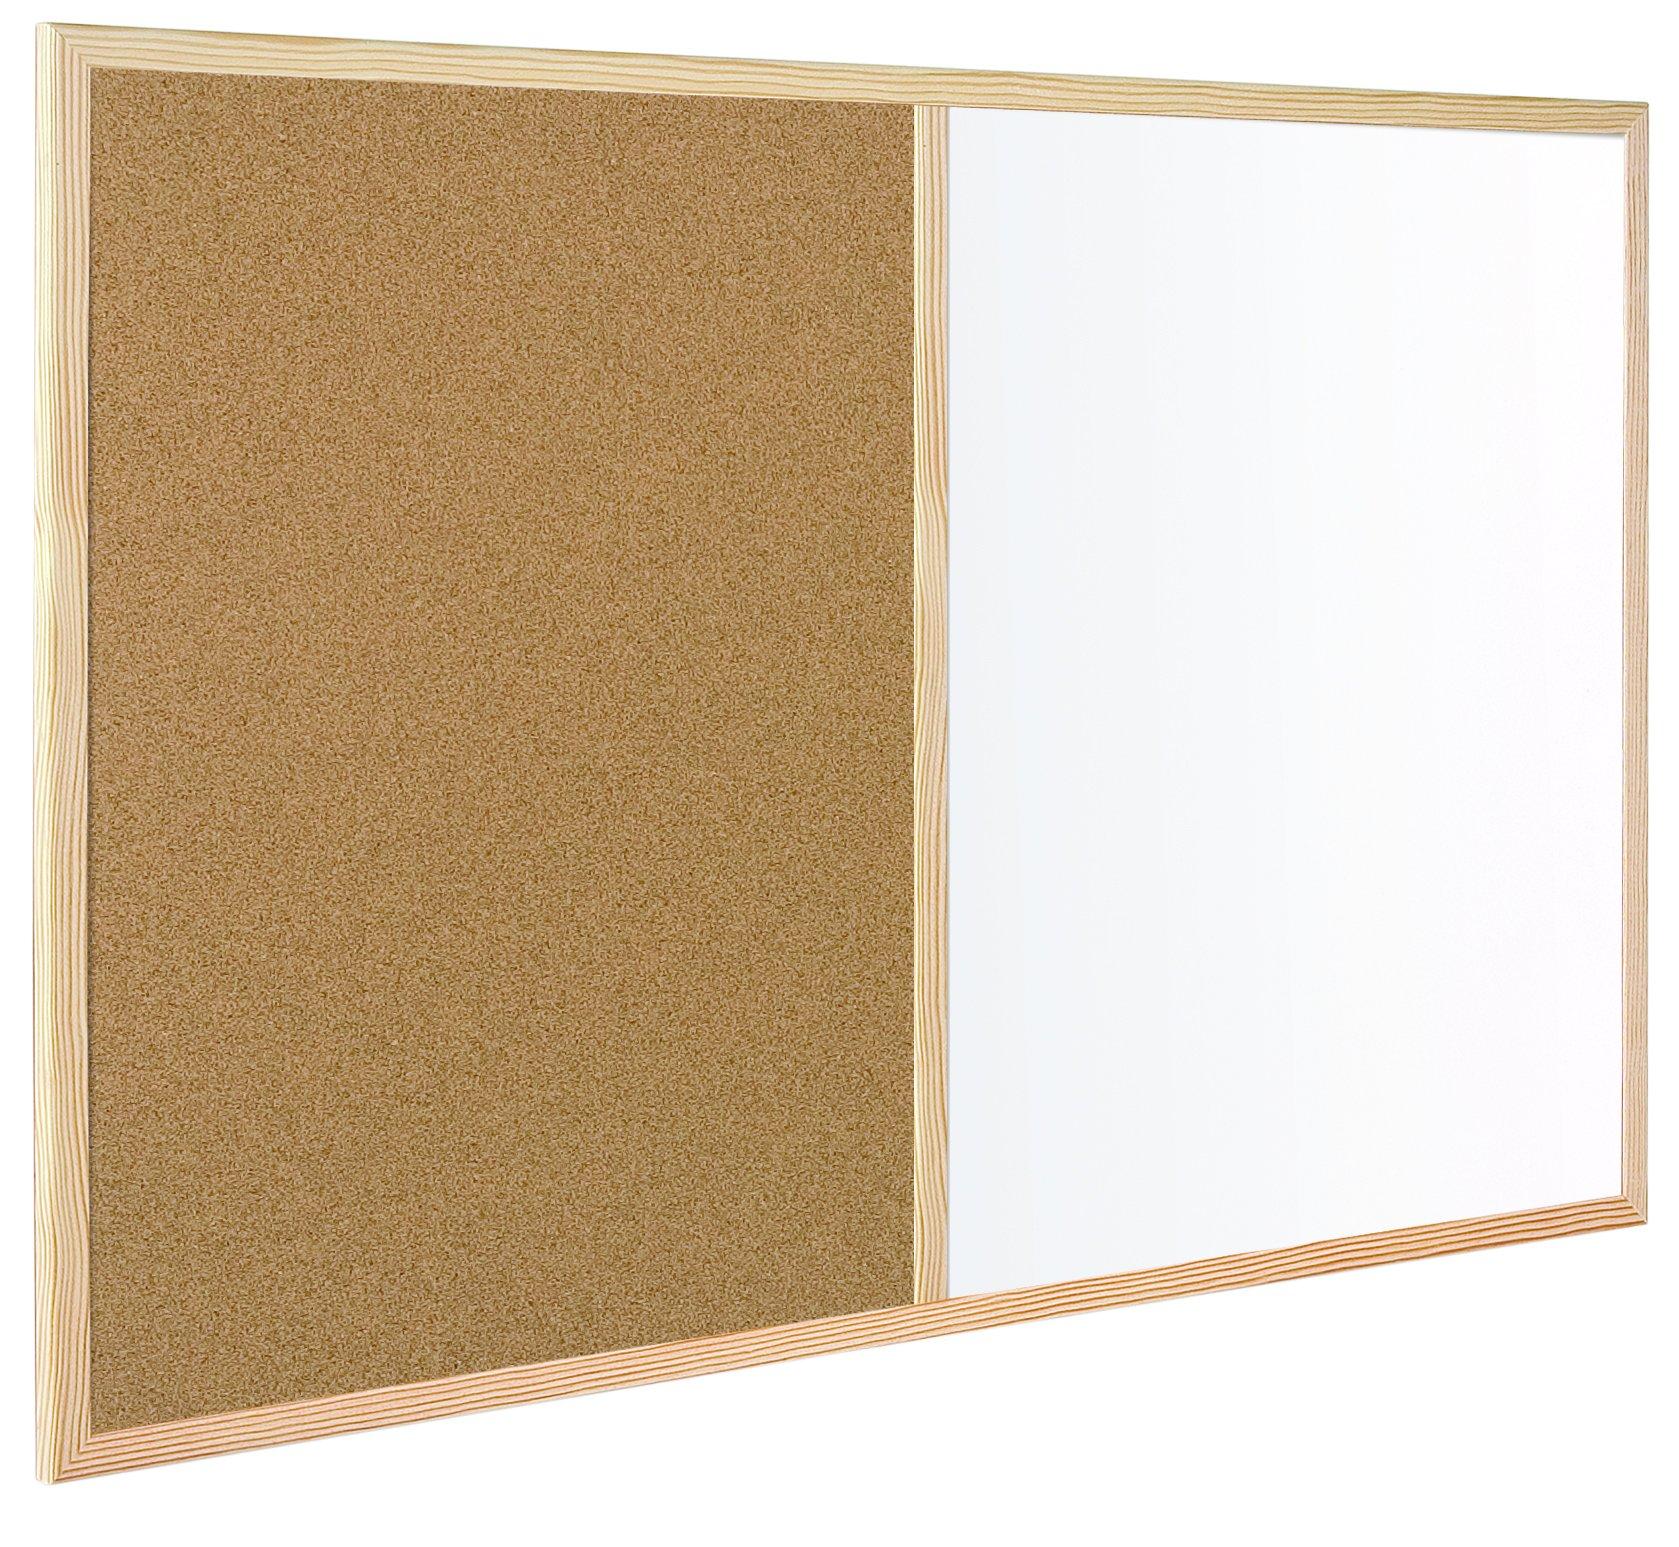 MasterVision Combination Dry Erase / Cork Bulletin Board, 3 x 4 Feet, Oak Frame (MX141212319)